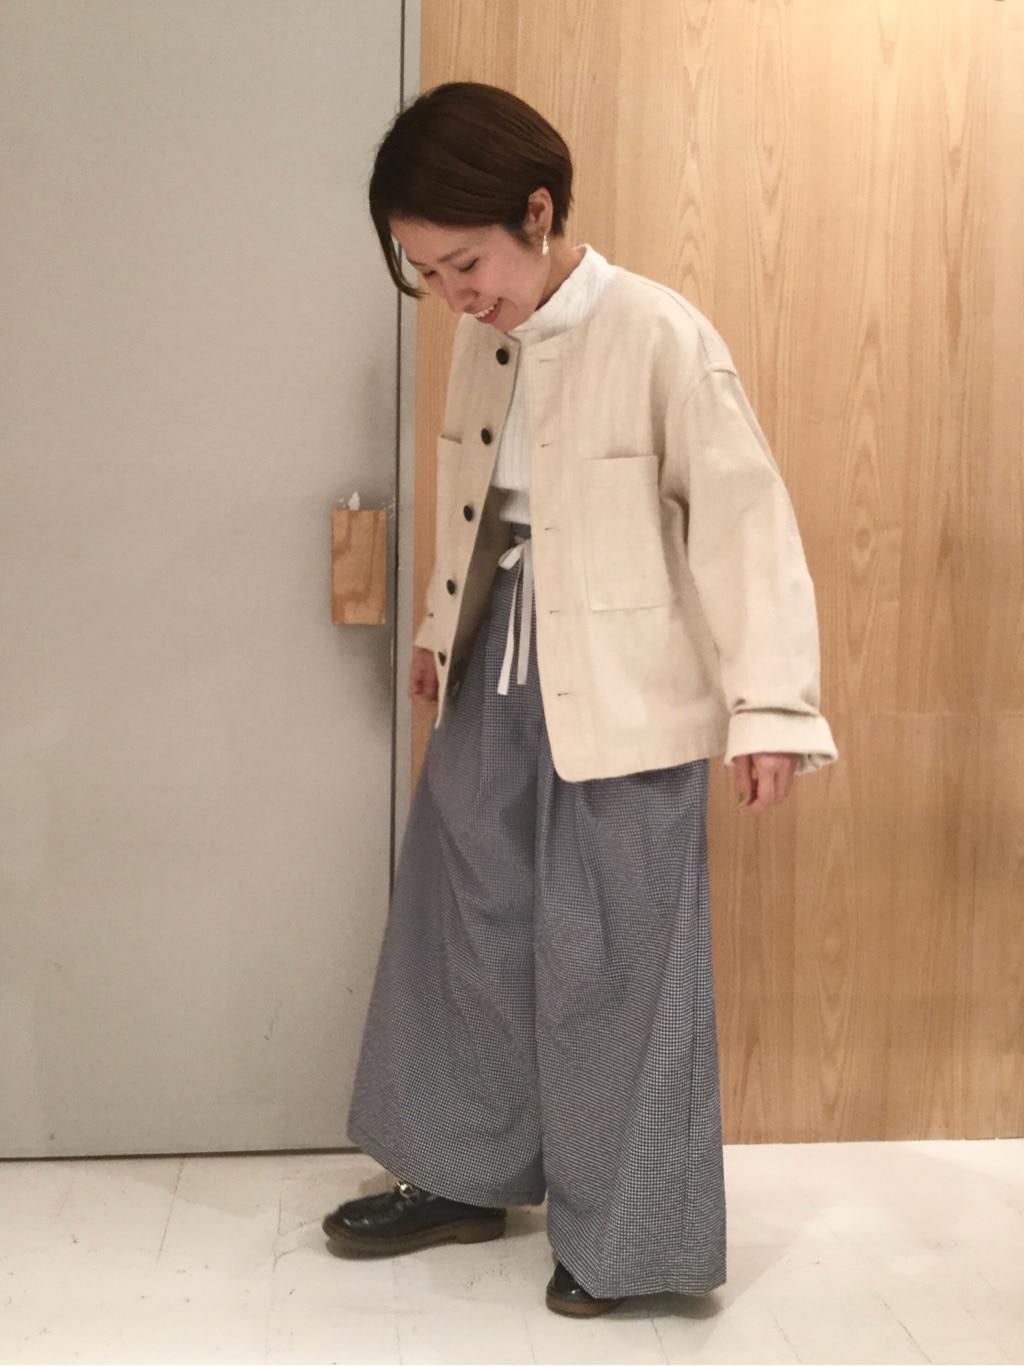 bulle de savon なんばシティ 身長:148cm 2020.03.13